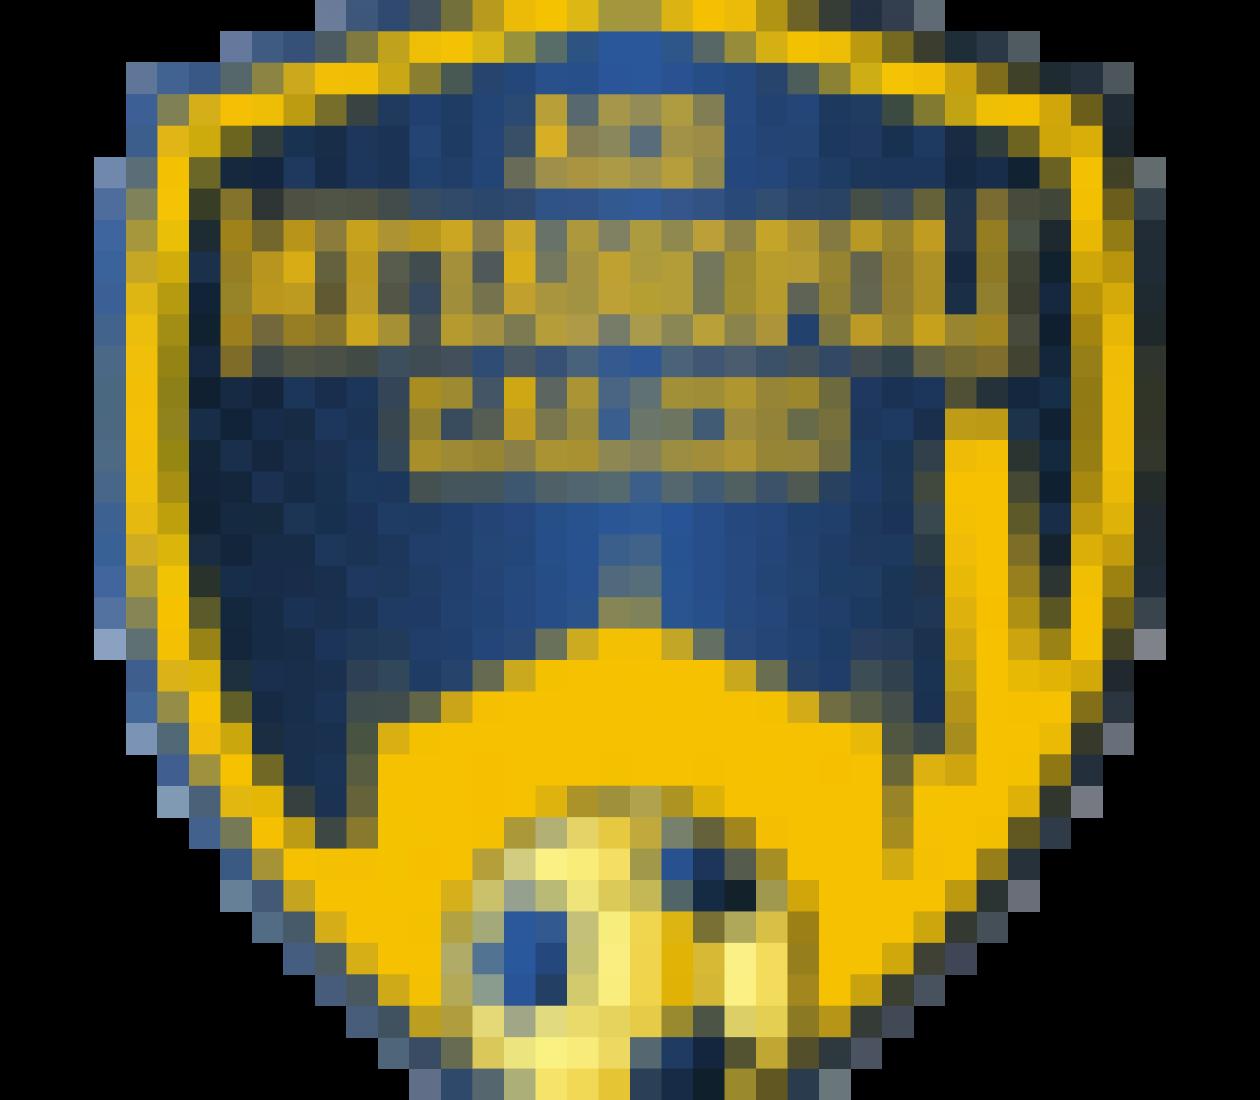 Metanopoli Calcio